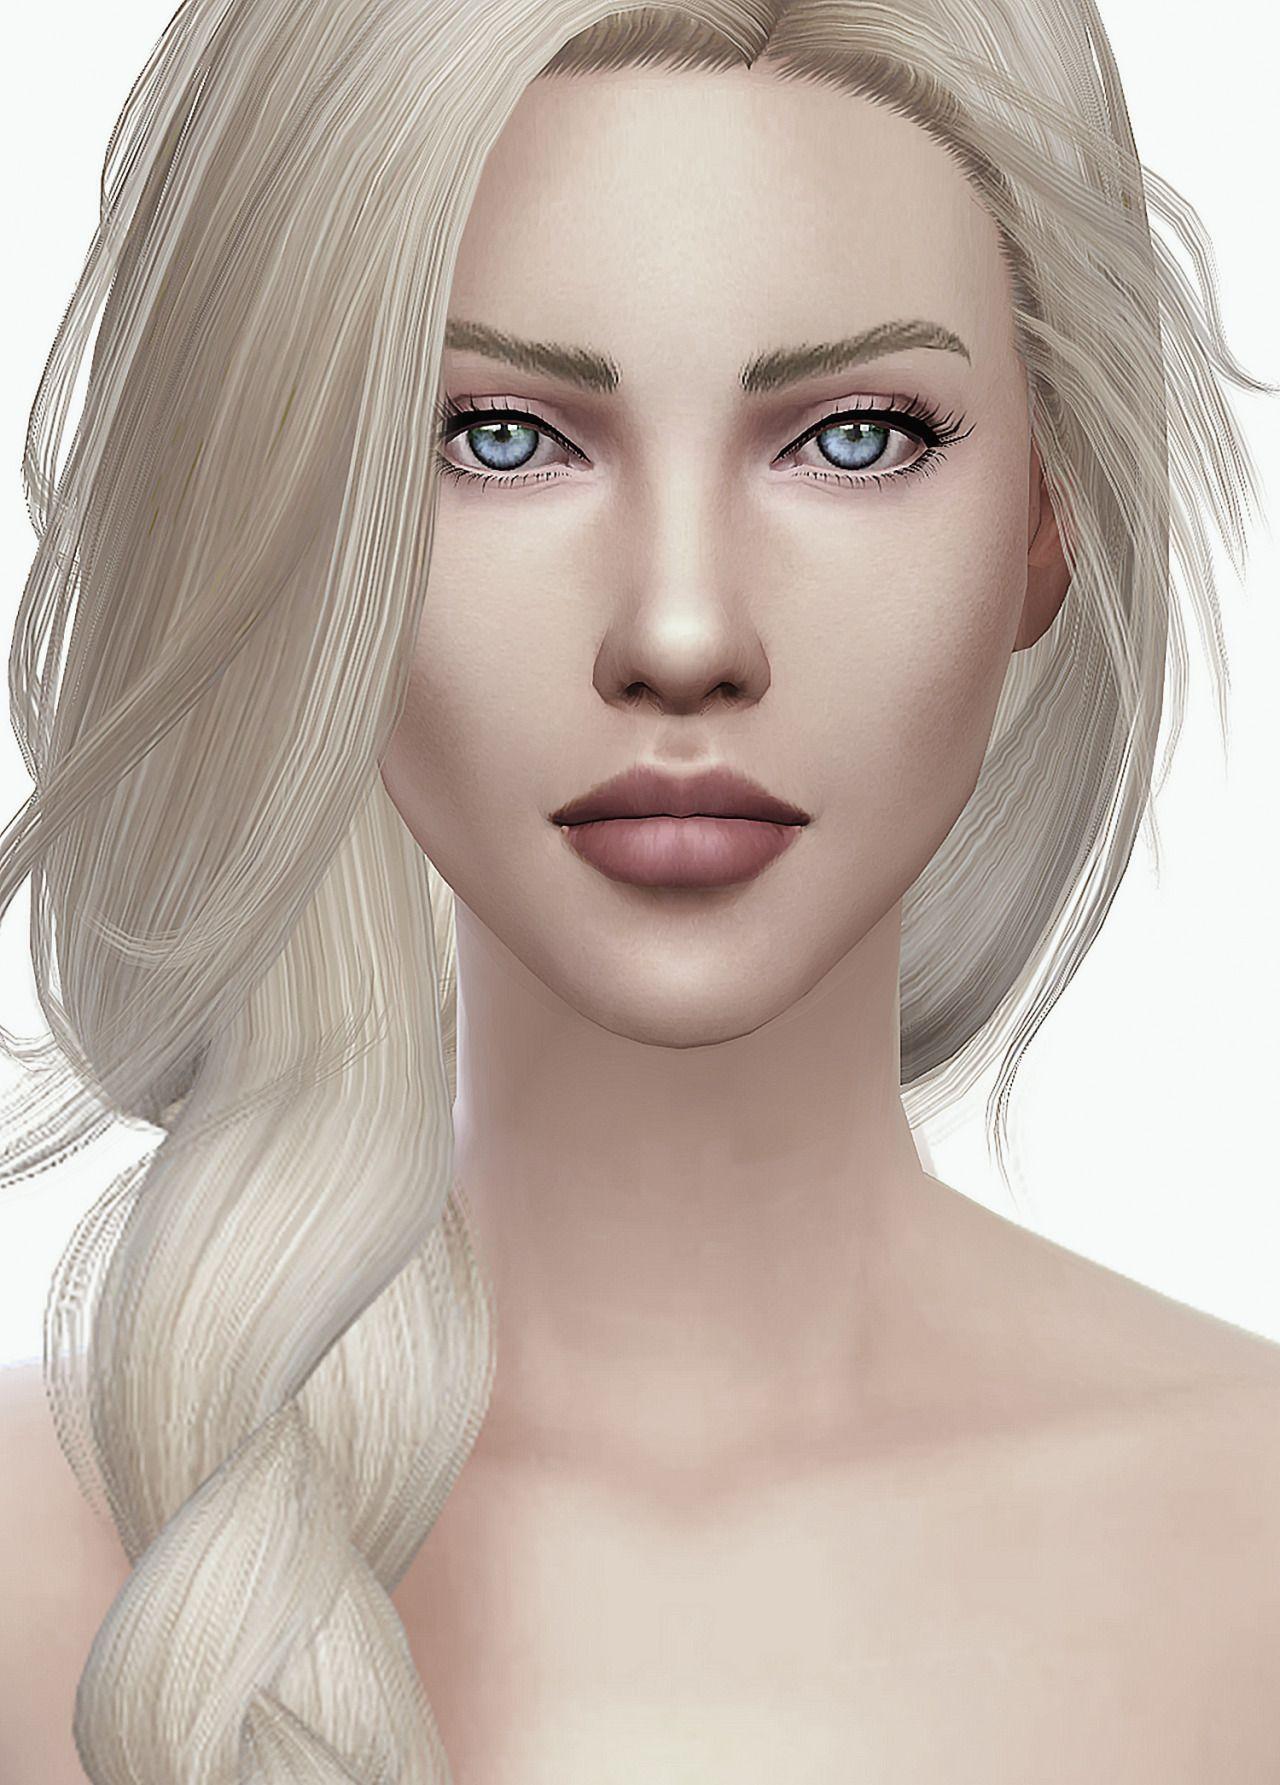 Luna skin! | Sims 4 mods ^_^ | Sims, The sims 4 skin och ...